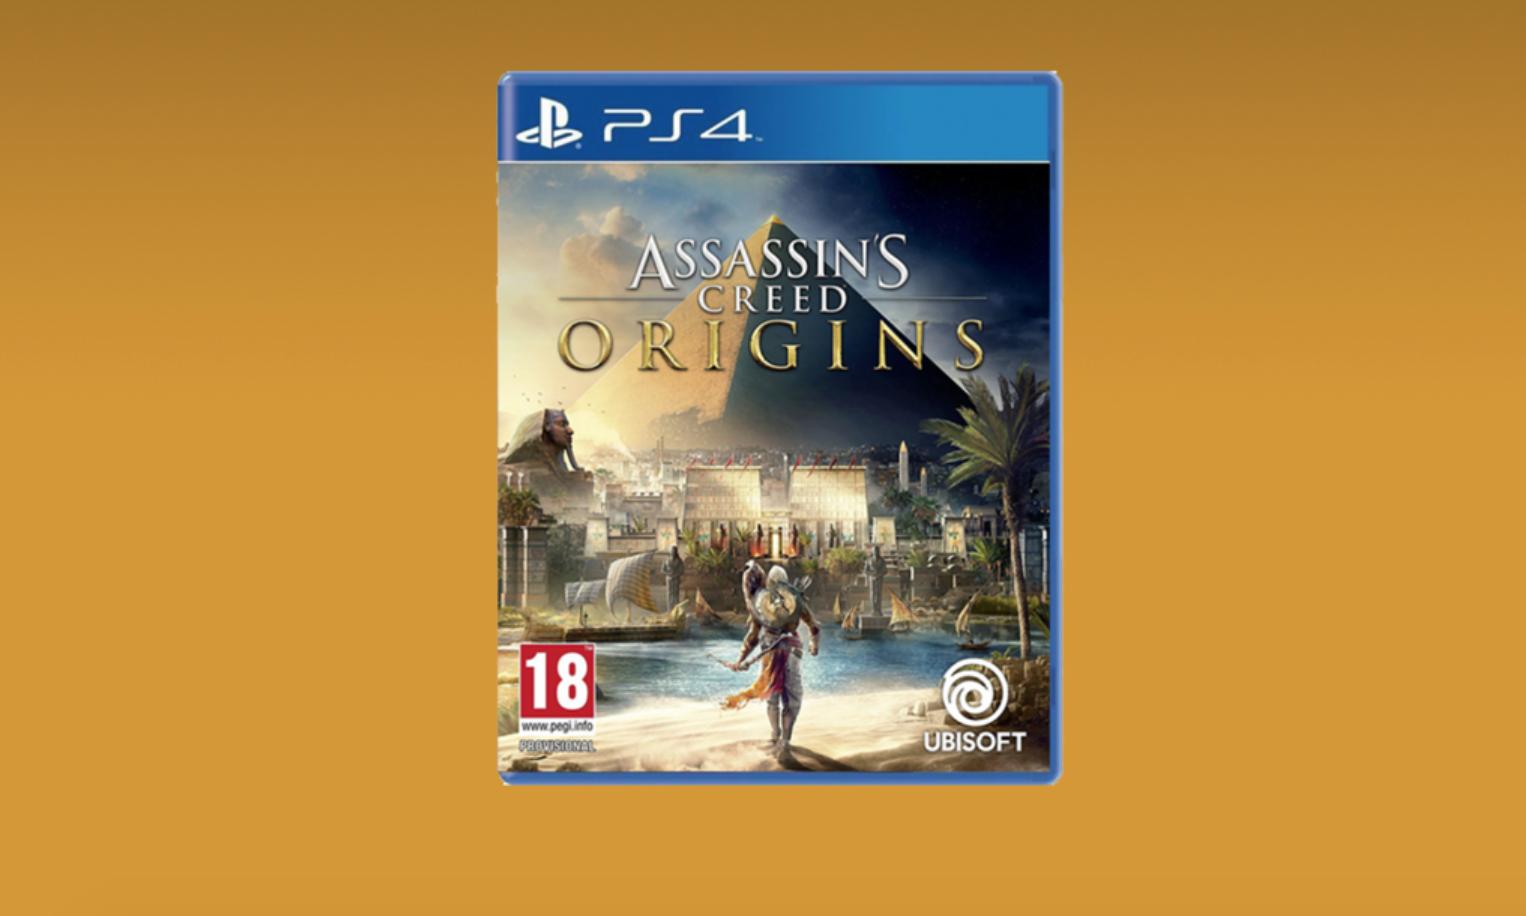 Assassins Creed Origins Playstation 4